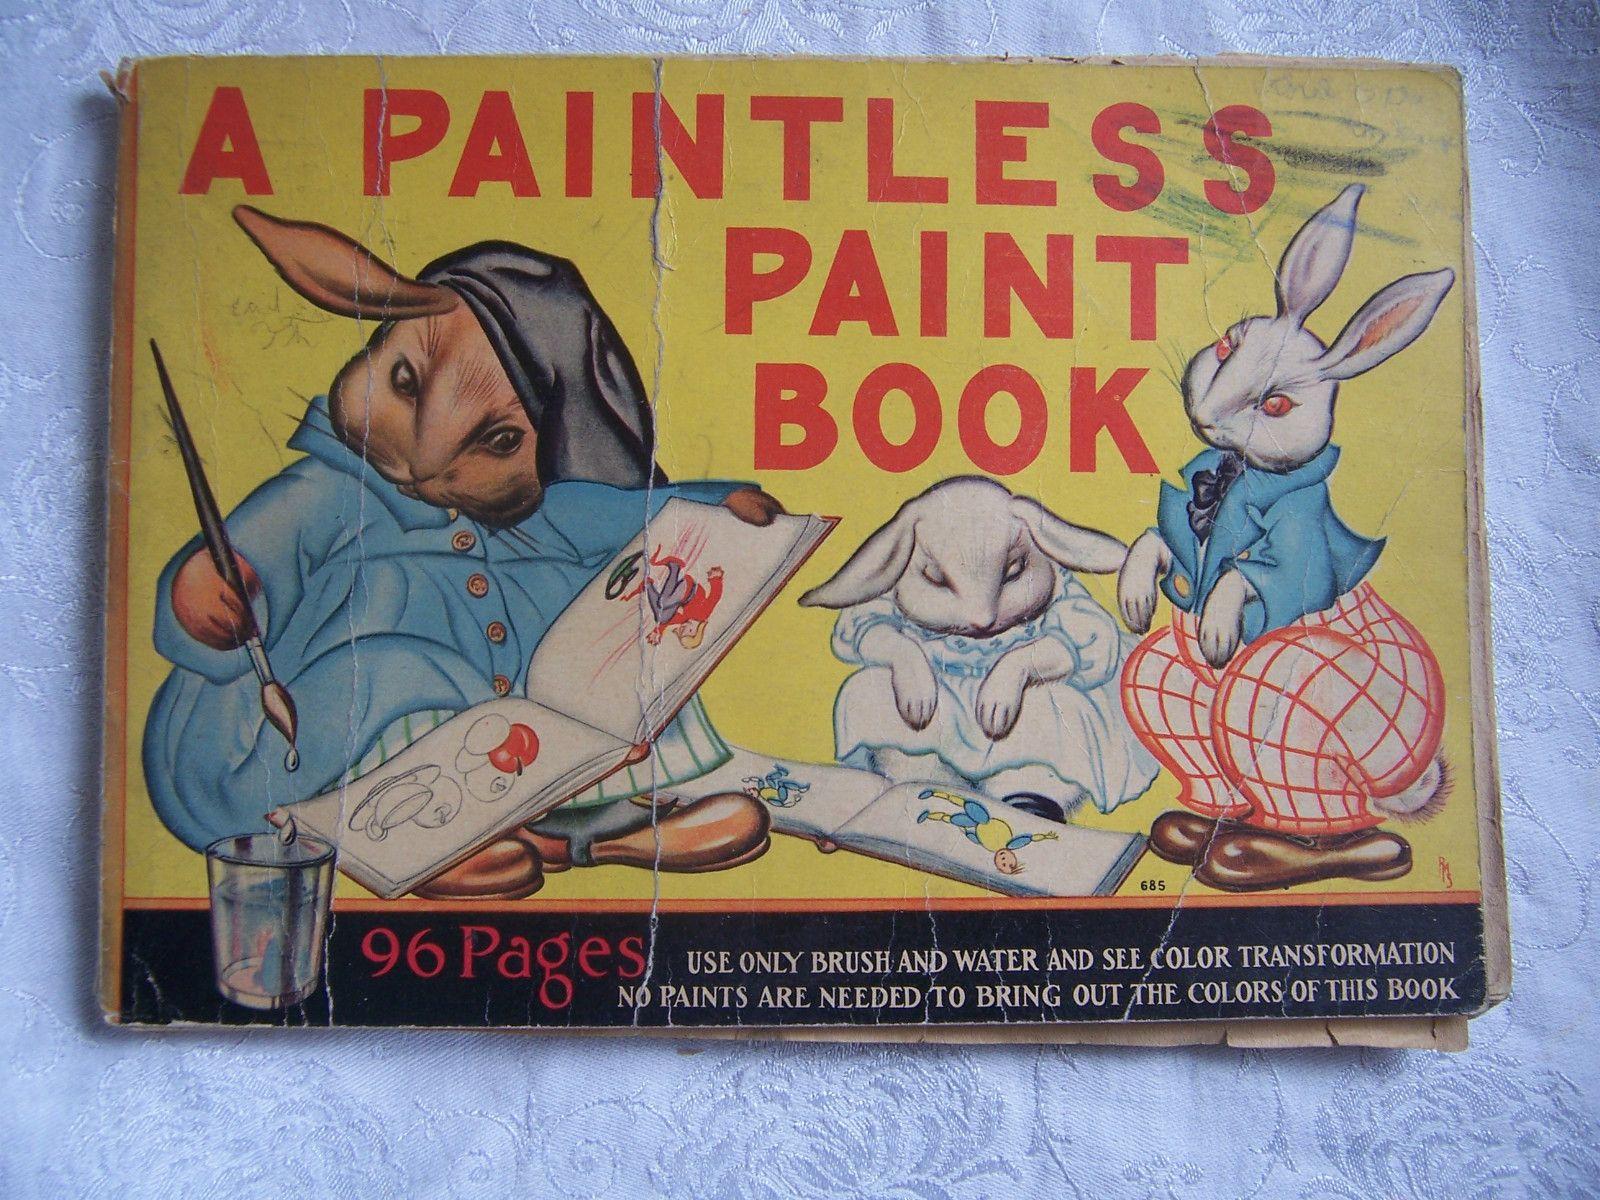 Vintage Big Paint Book Paintless Paint Book1930s Coloring Book 685 Whitman Painted Books Coloring Books Painting